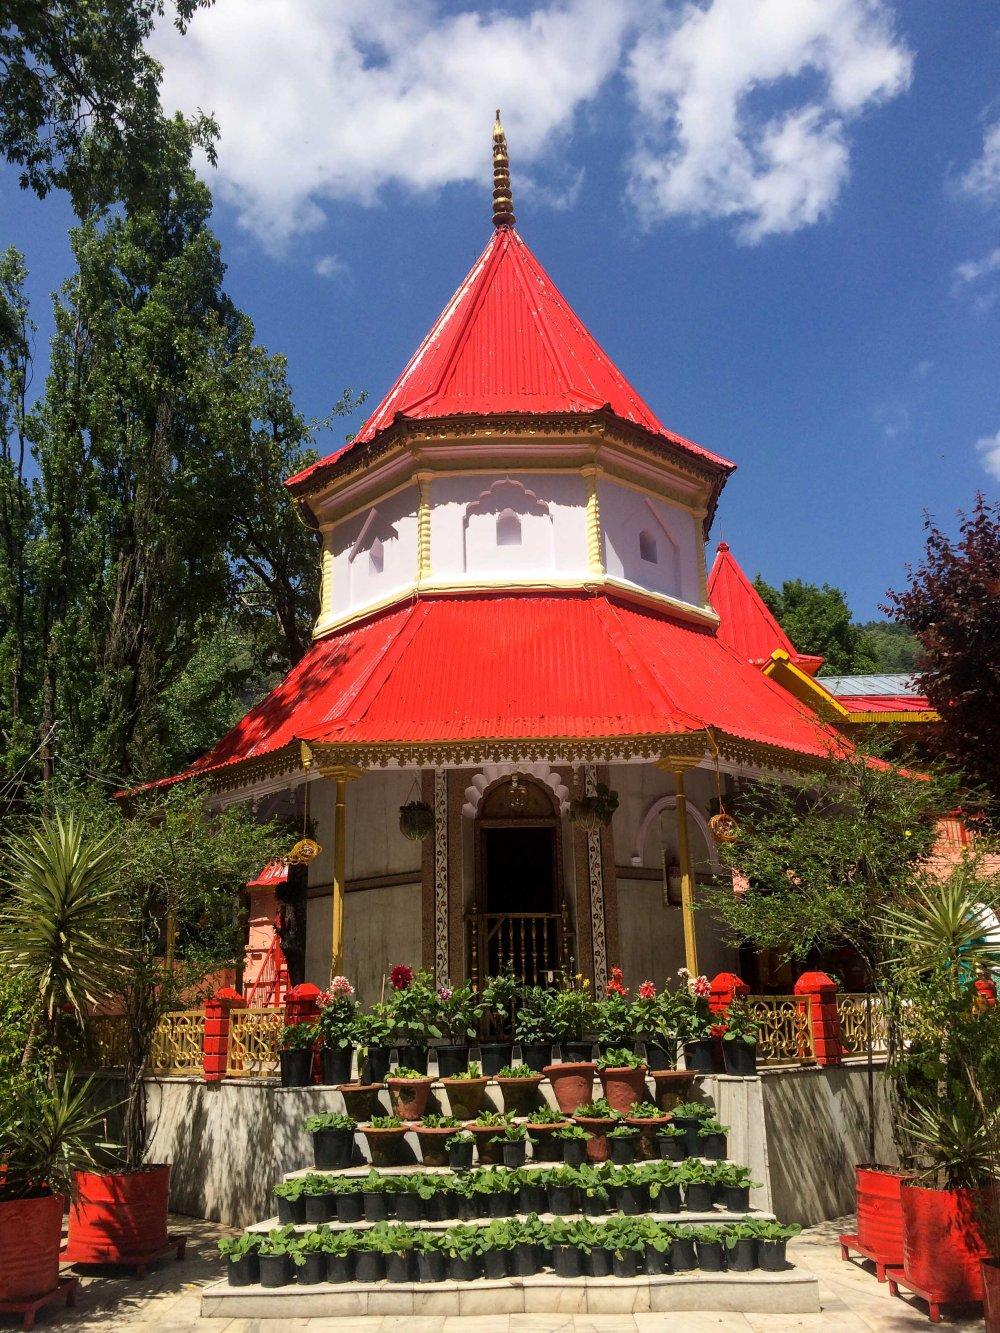 Naina Devi Temple 1